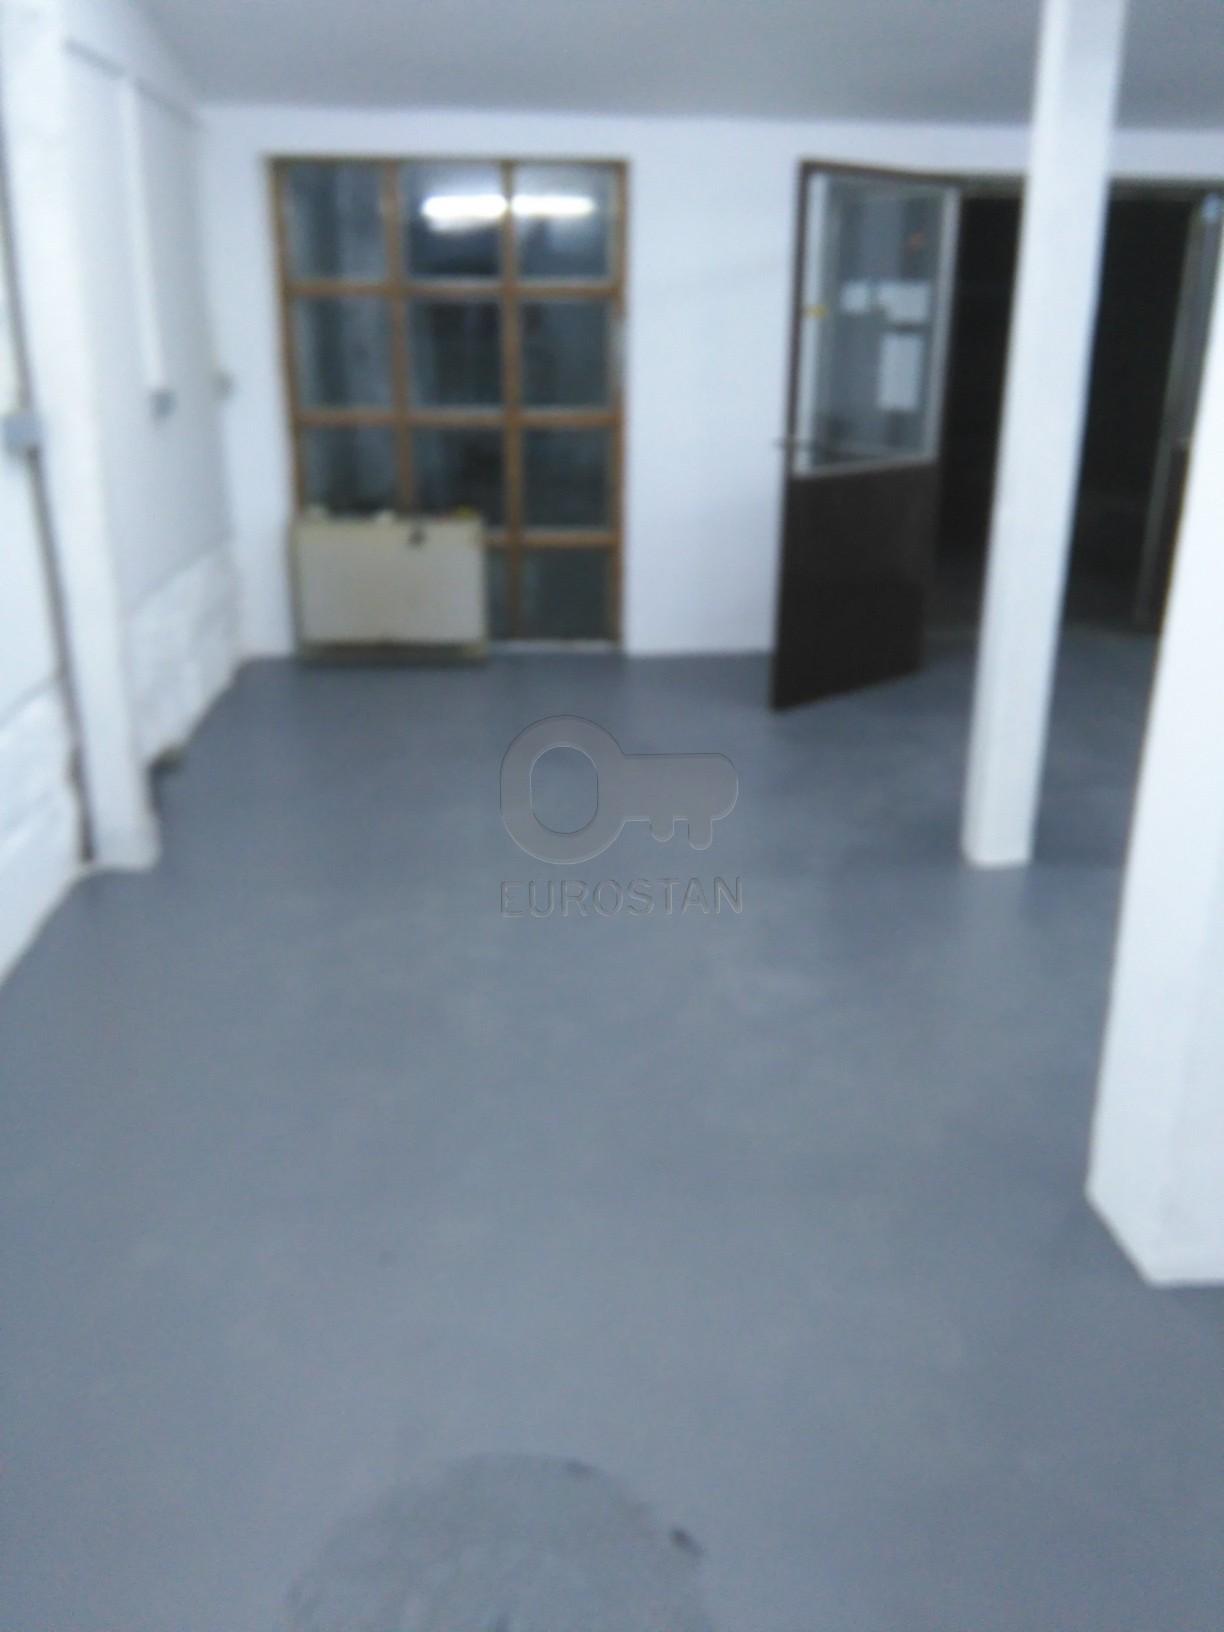 Poslovni prostor SAVE KOVAČEVIĆA 500 EUR